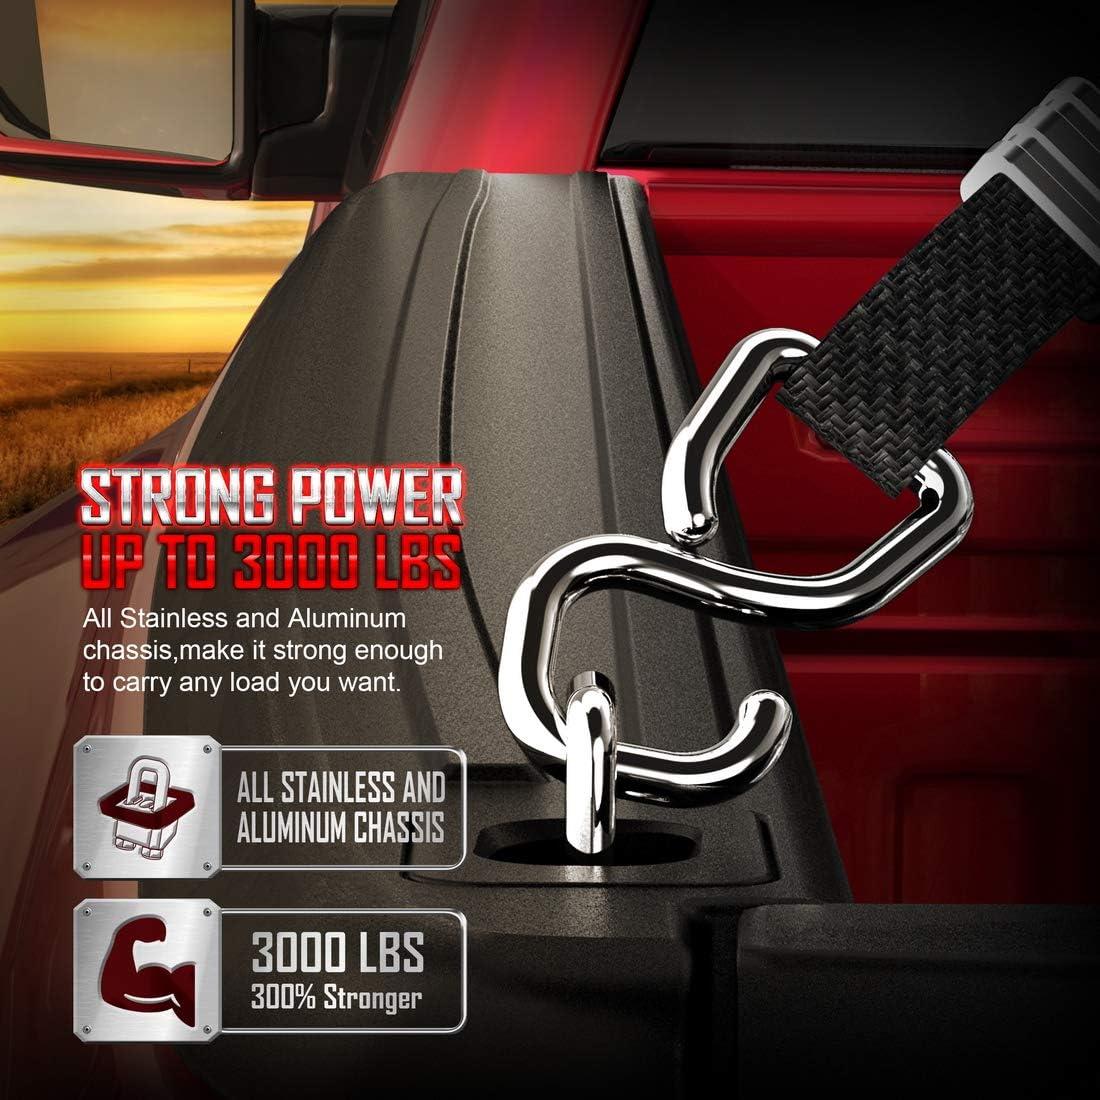 Tigeracing Tie Down Anchors Retractable Truck Bed Top Side D Ring Compatible 1988-2013 Silverado 1500 2500 /& Sierra 1500 2500 All Metal 3000 LBS Capacity of 4